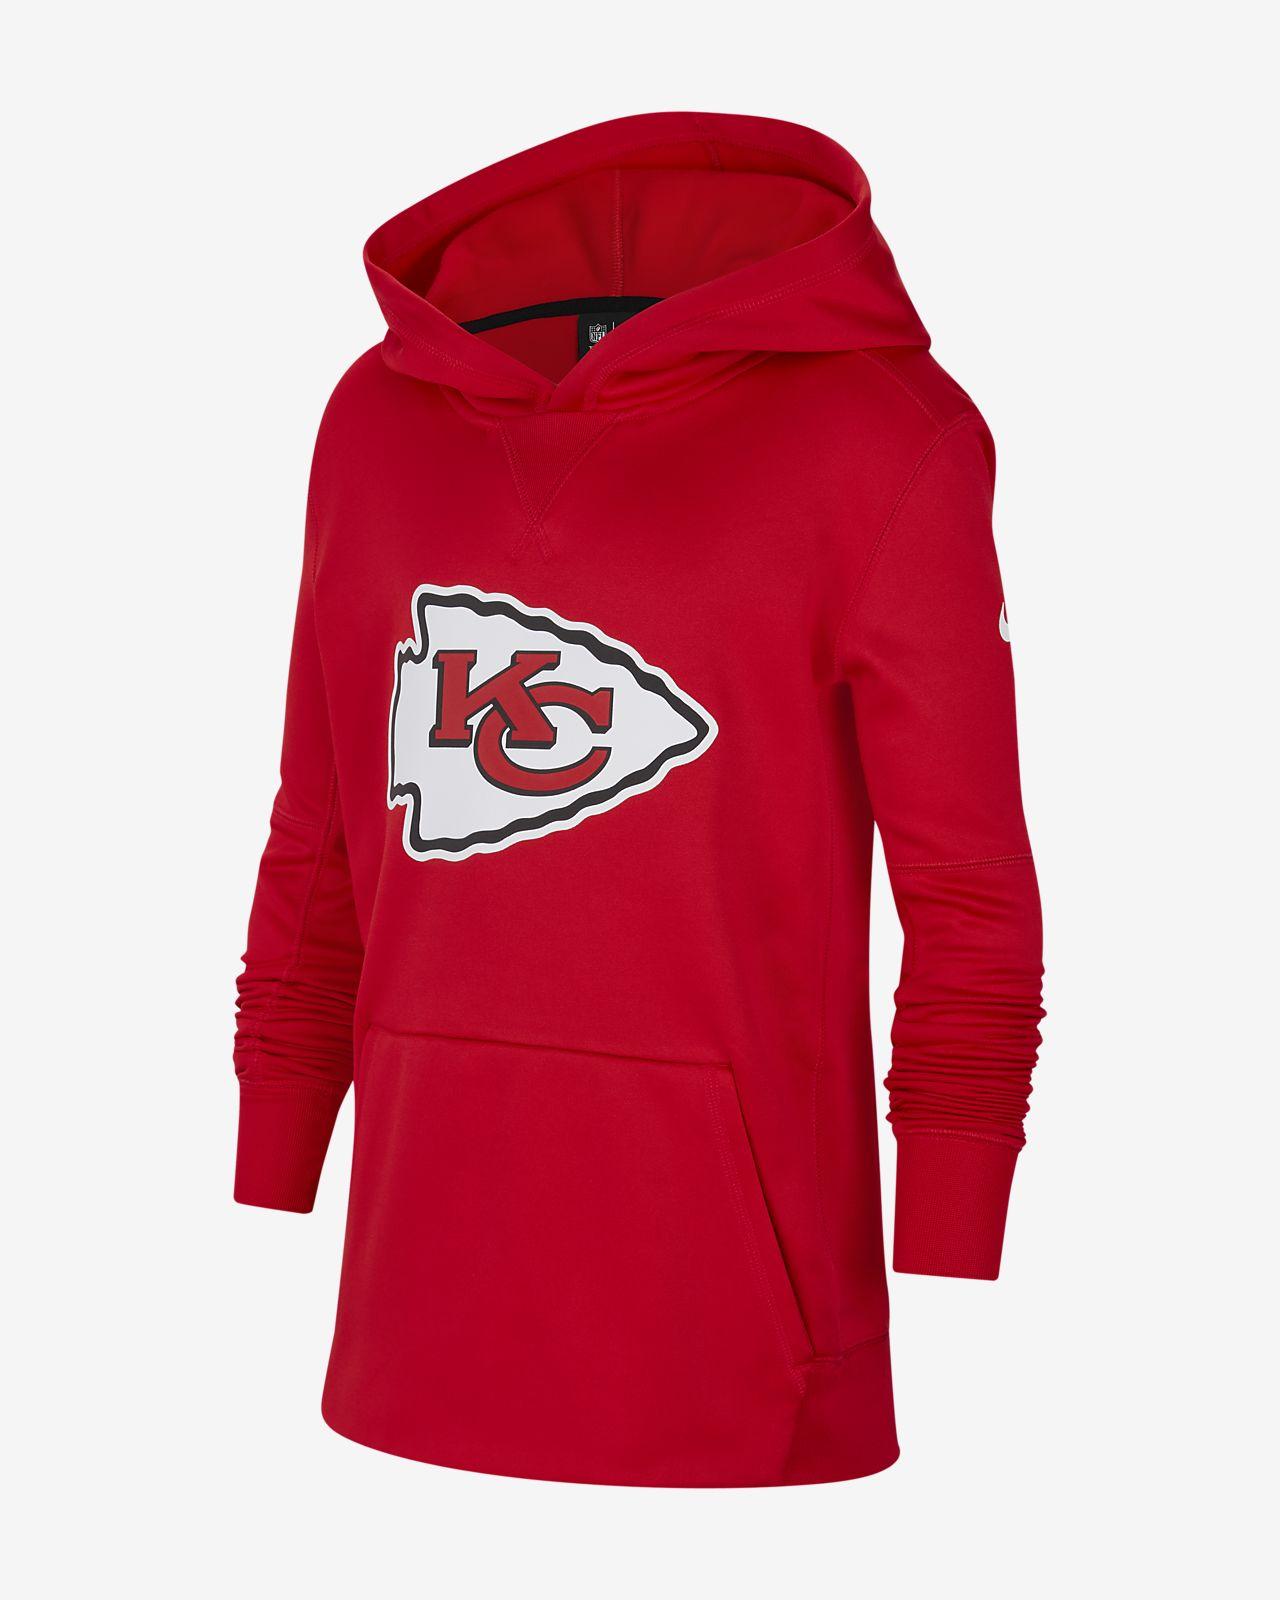 Nike (NFL Chiefs) Big Kids' Logo Hoodie